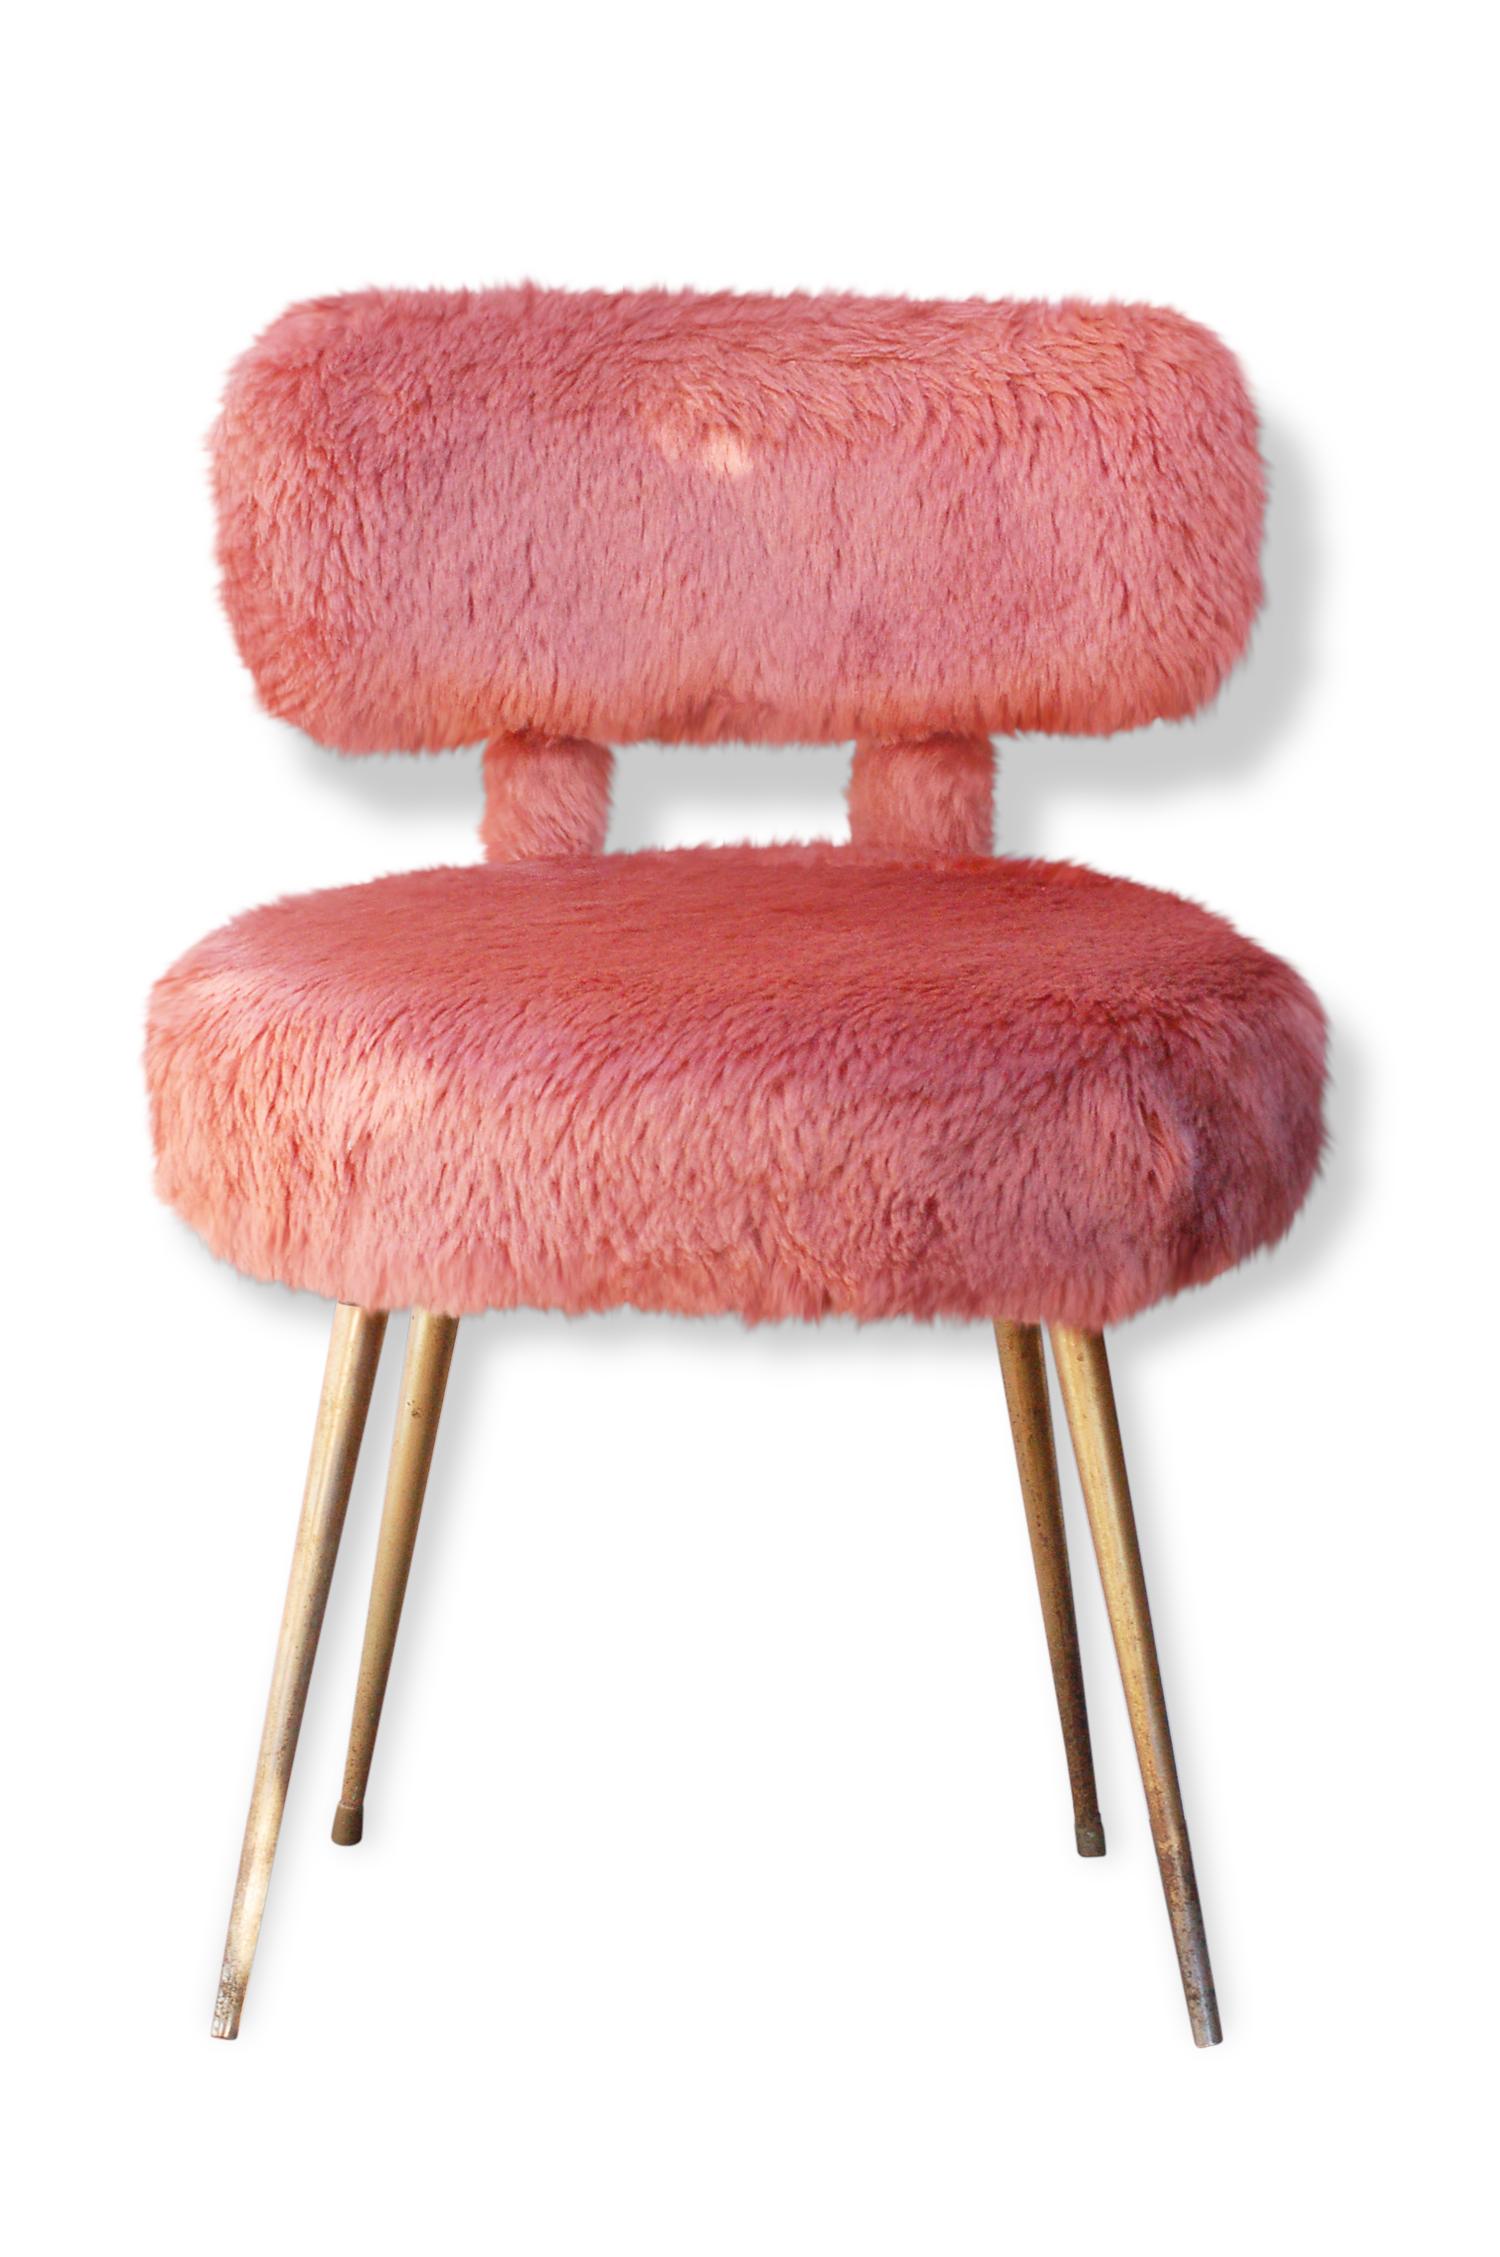 Chaise moumoute rose.